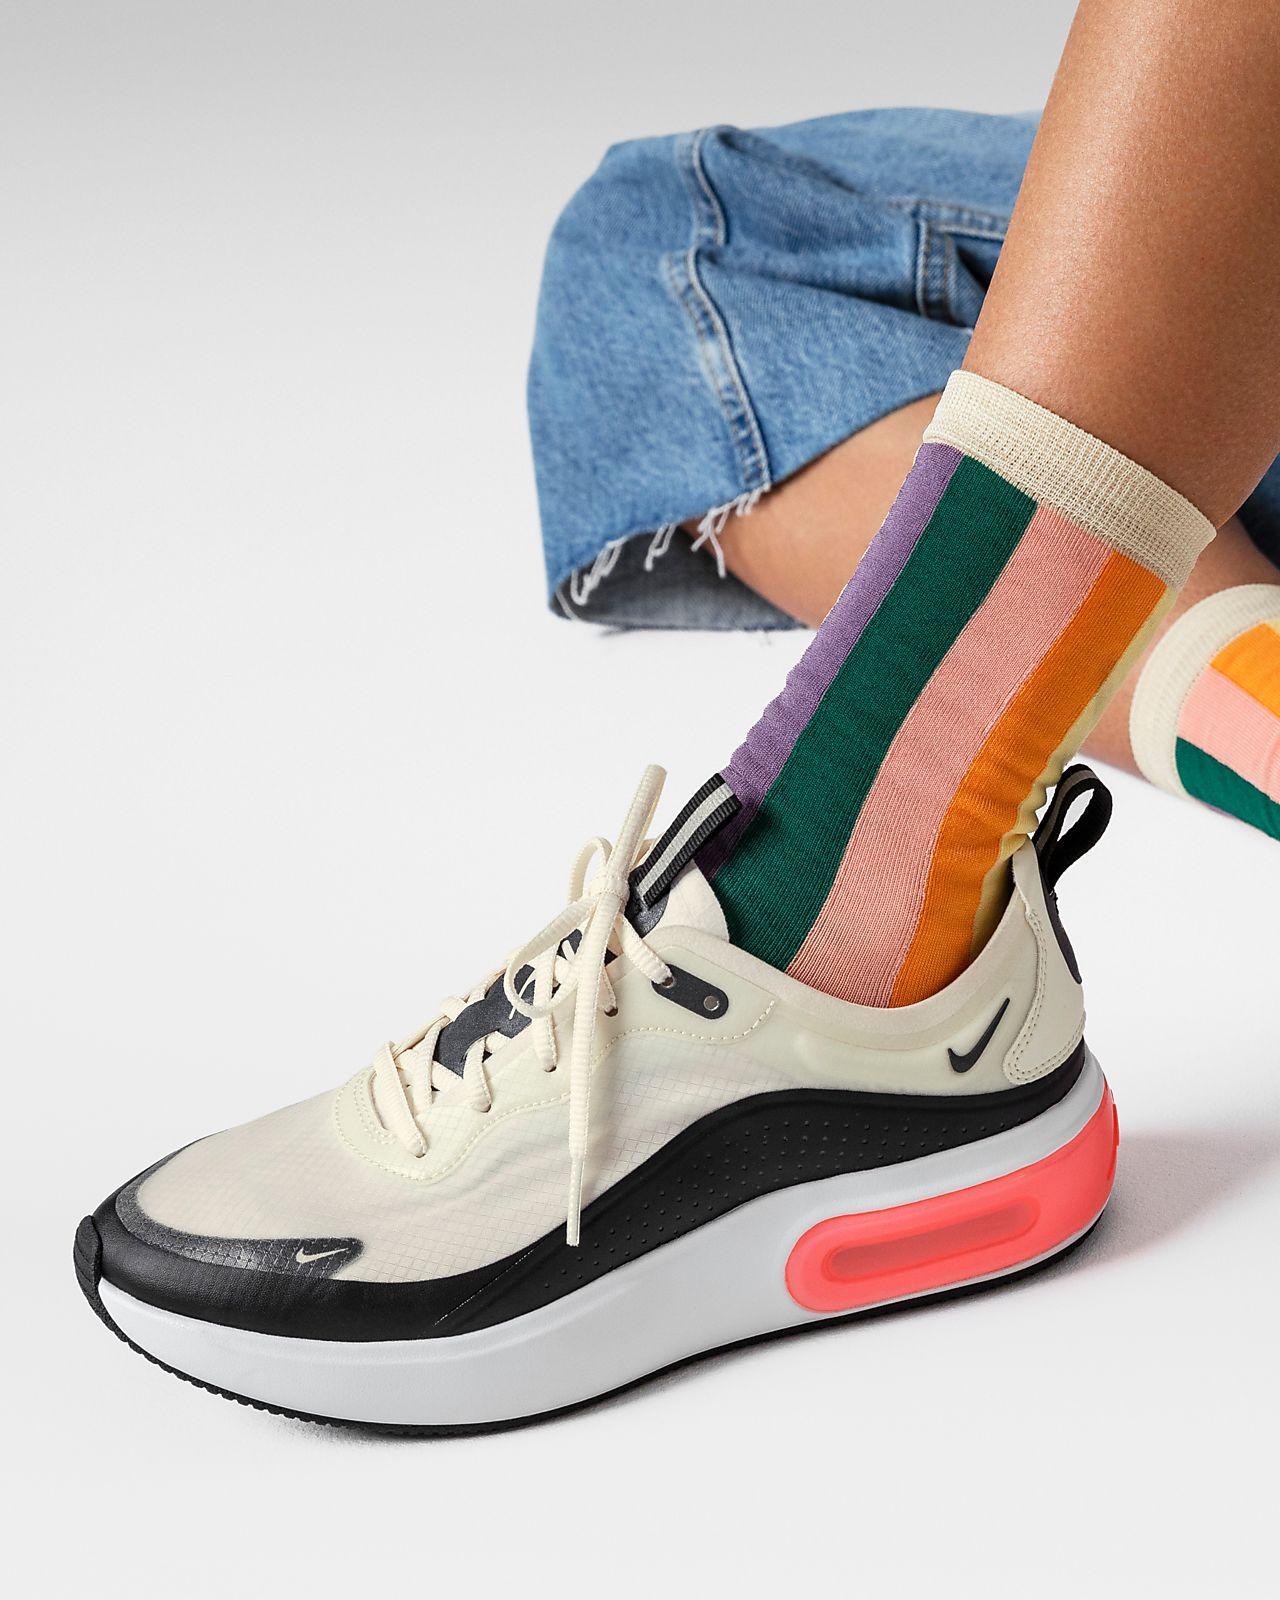 Boys' Big Kids' Nike Air Max 97 SE Casual Shoes Finish Line